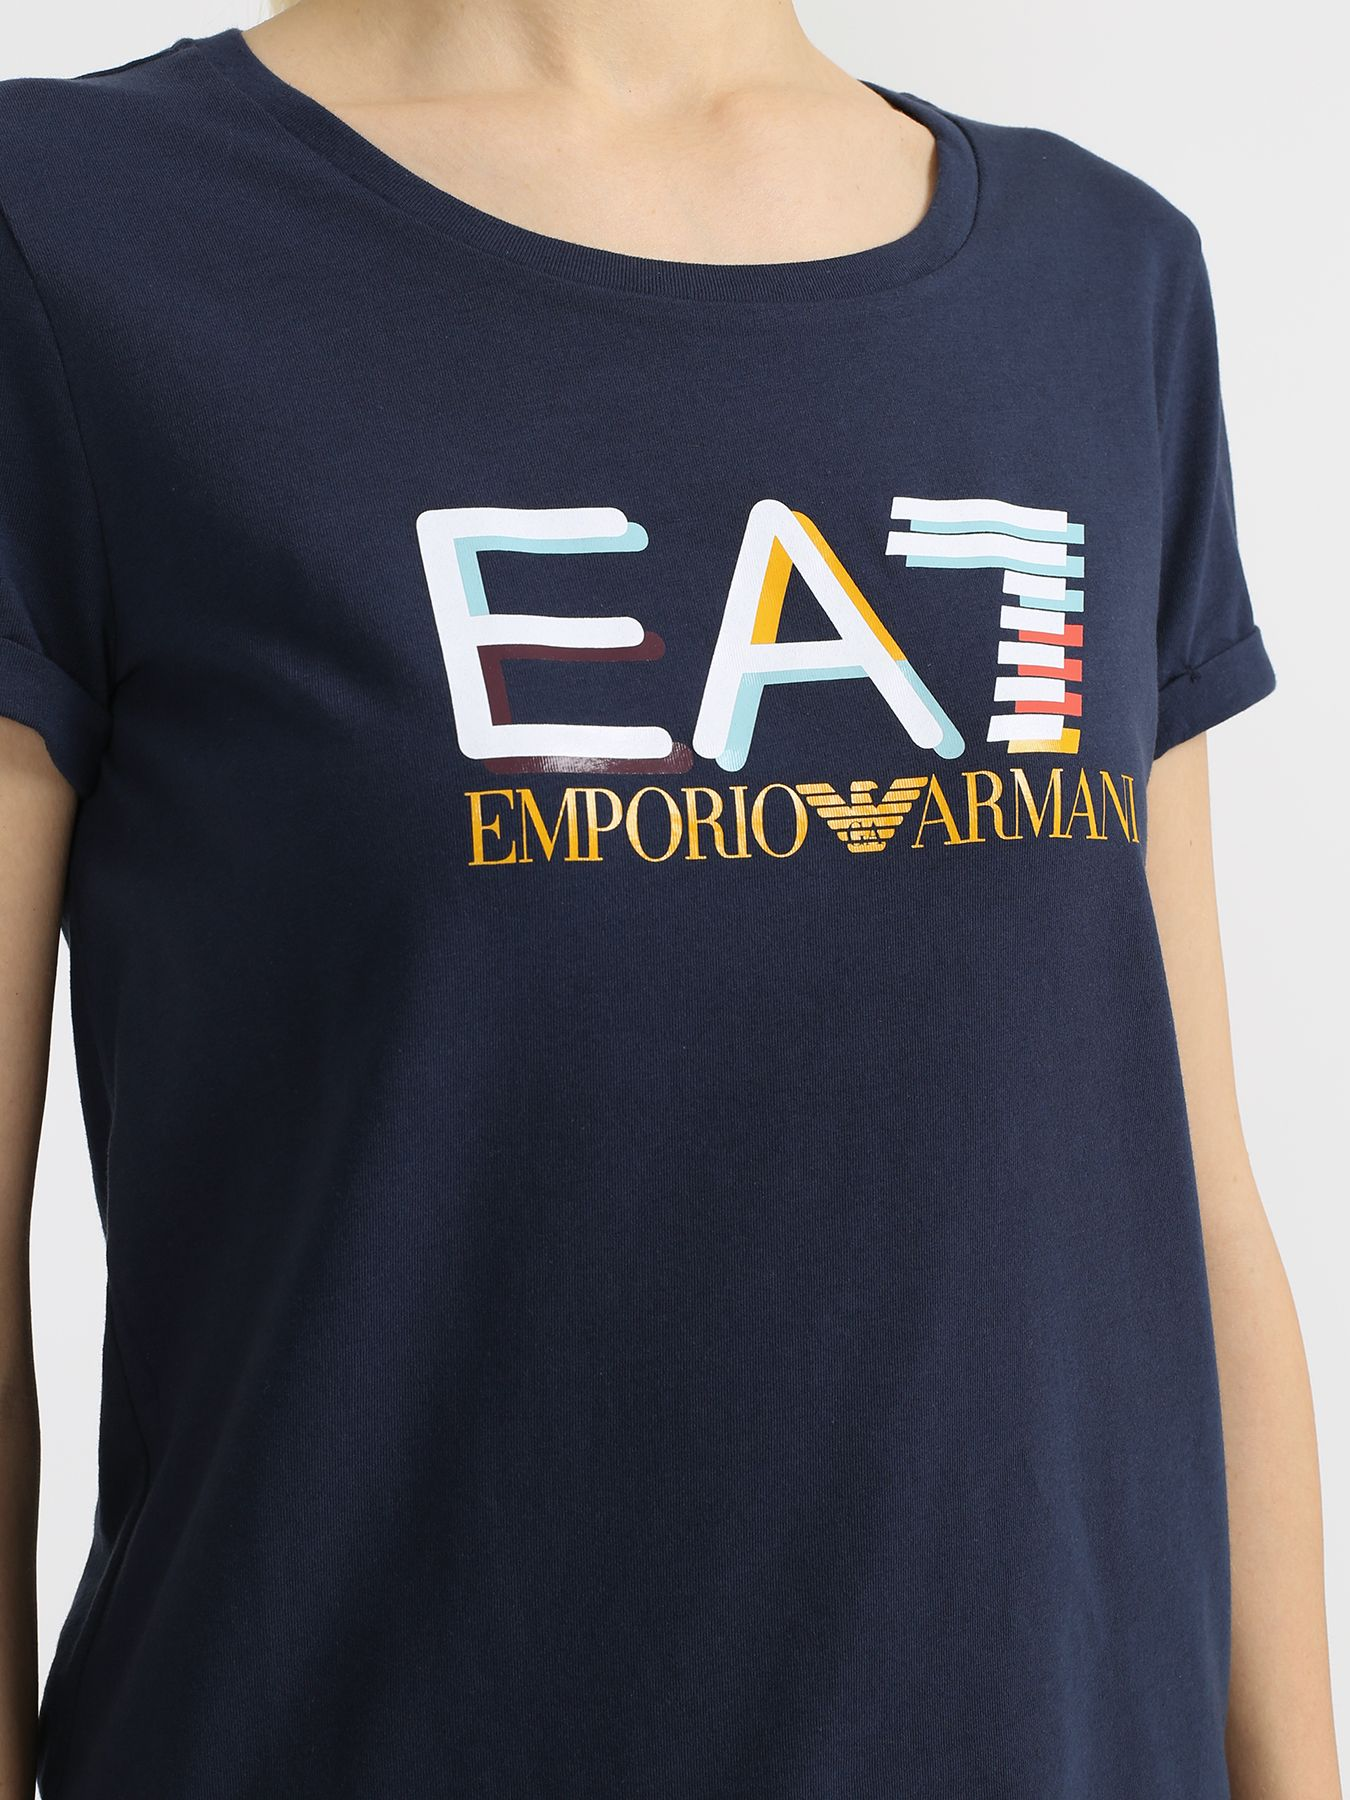 EA7 Emporio Armani Спортивная футболка 340516-044 Фото 3